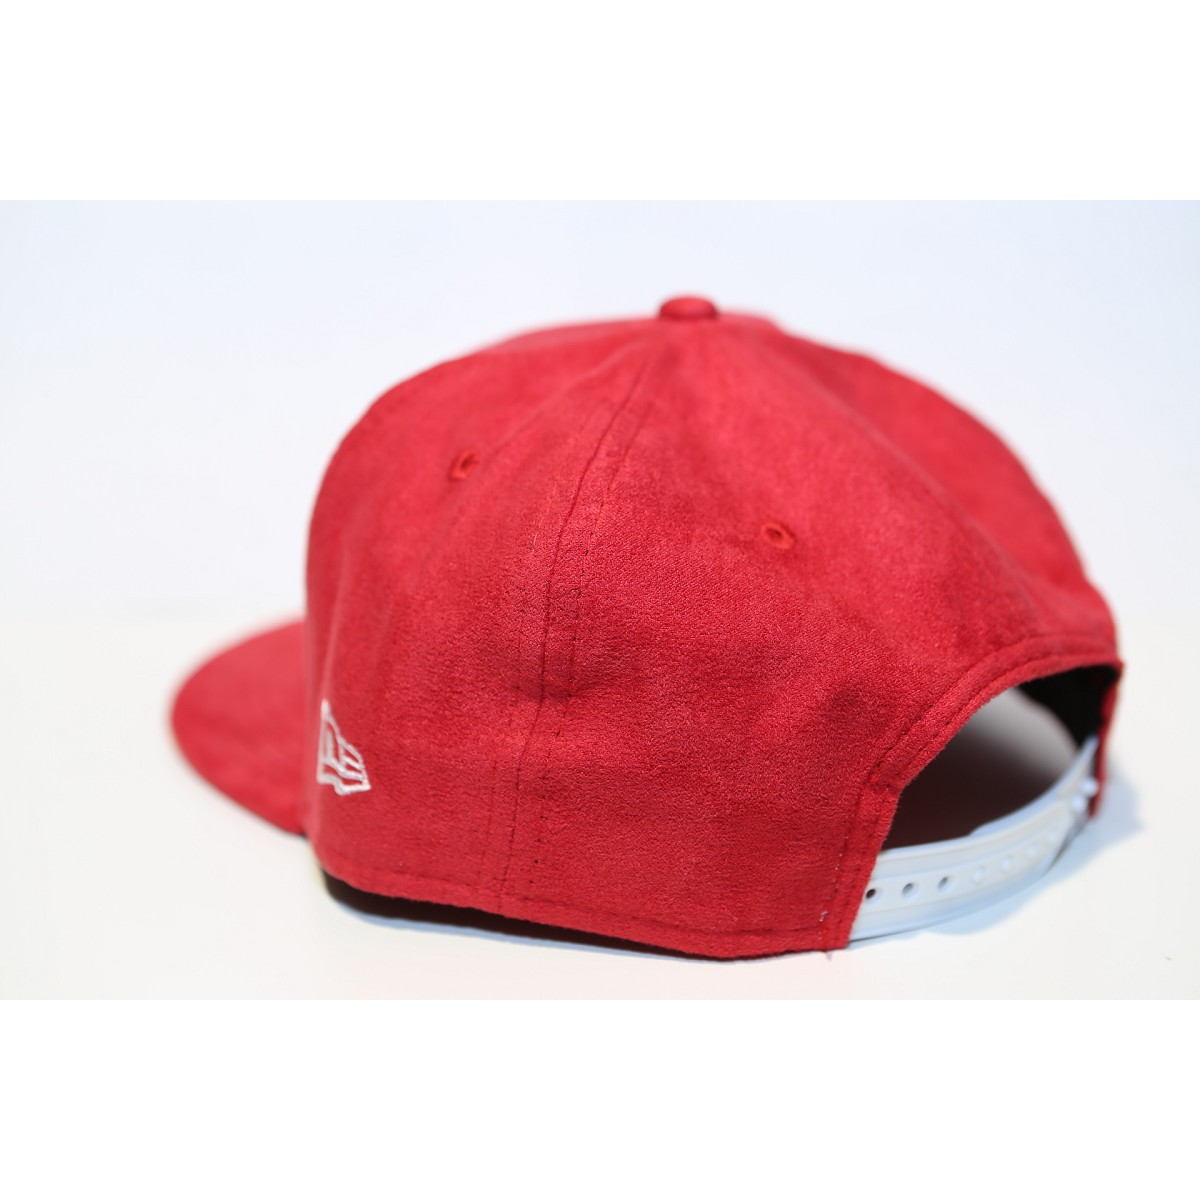 Cappello New Era 9fifty Team Suede Nfl San Francisco 49ers